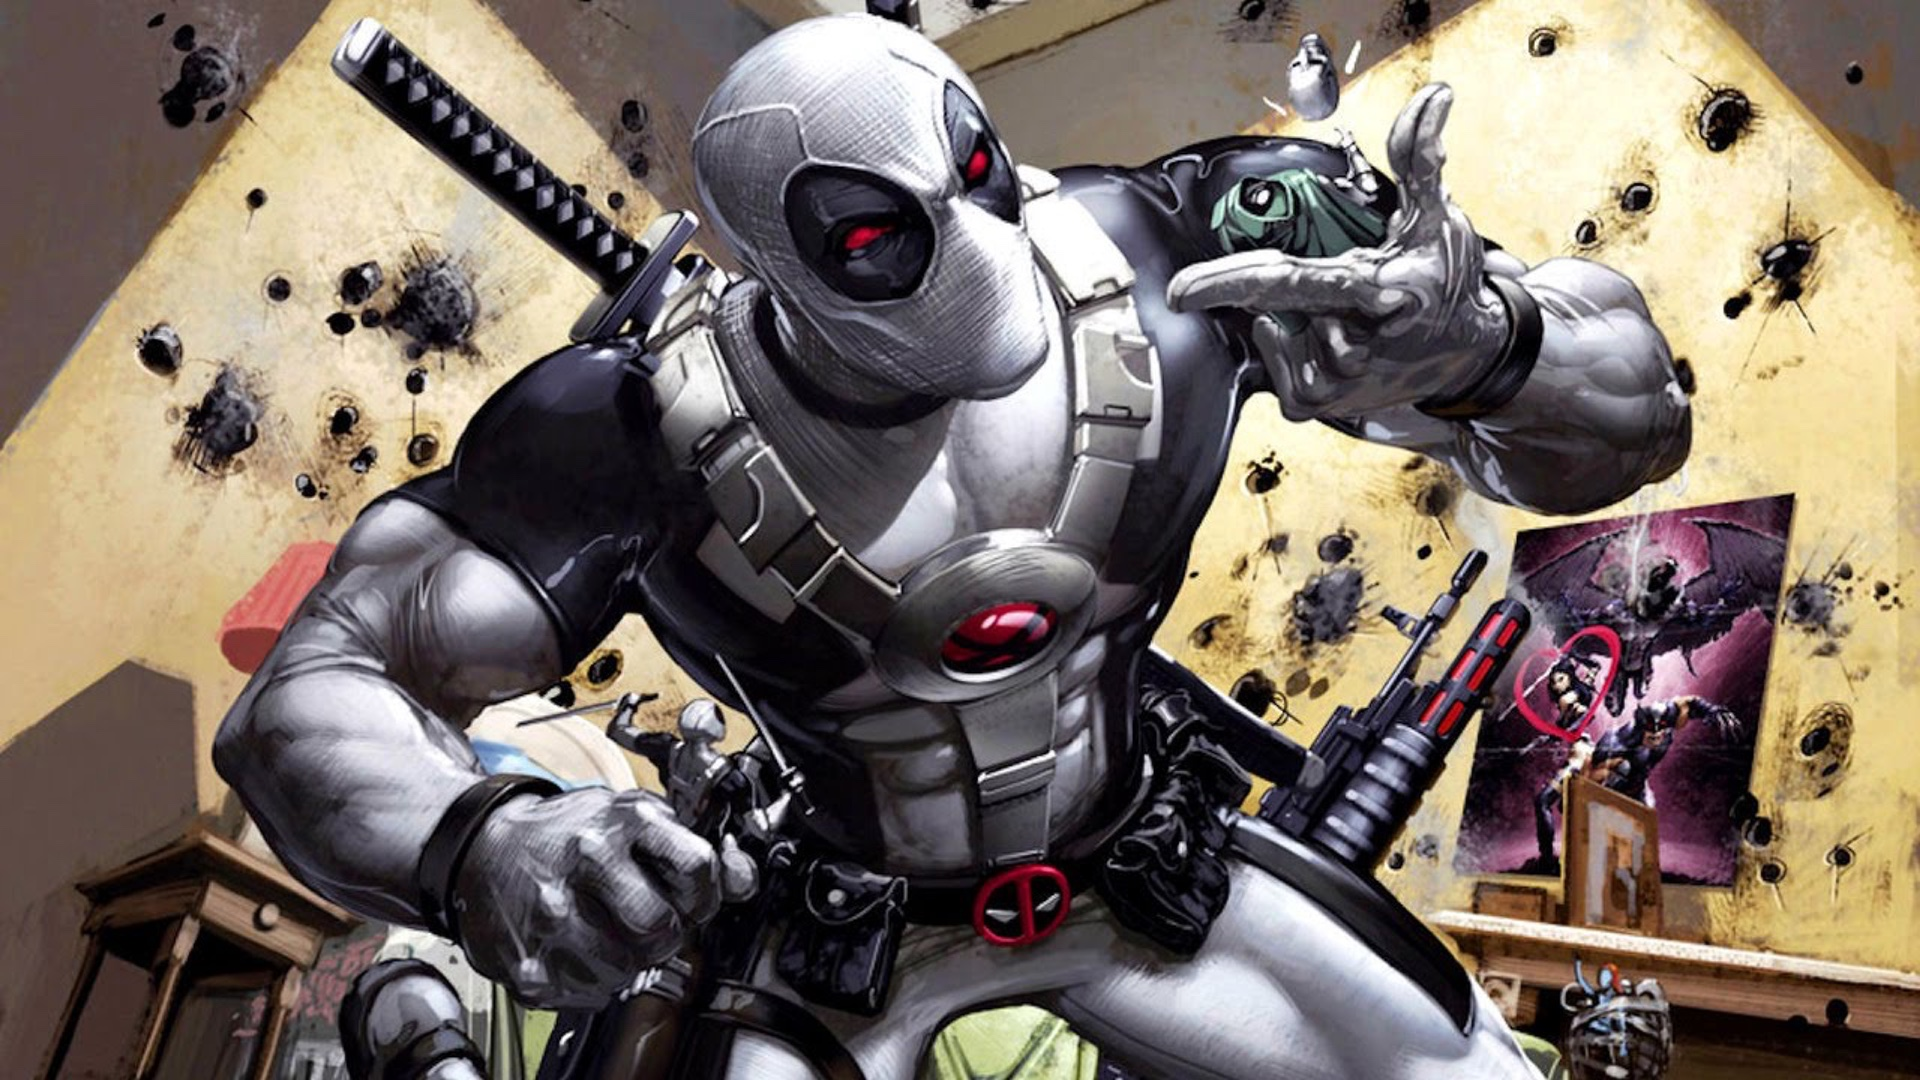 it-looks-like-deadpool-might-be-sporting-his-grey-x-force-suit-in-deadpool-2-social.jpg